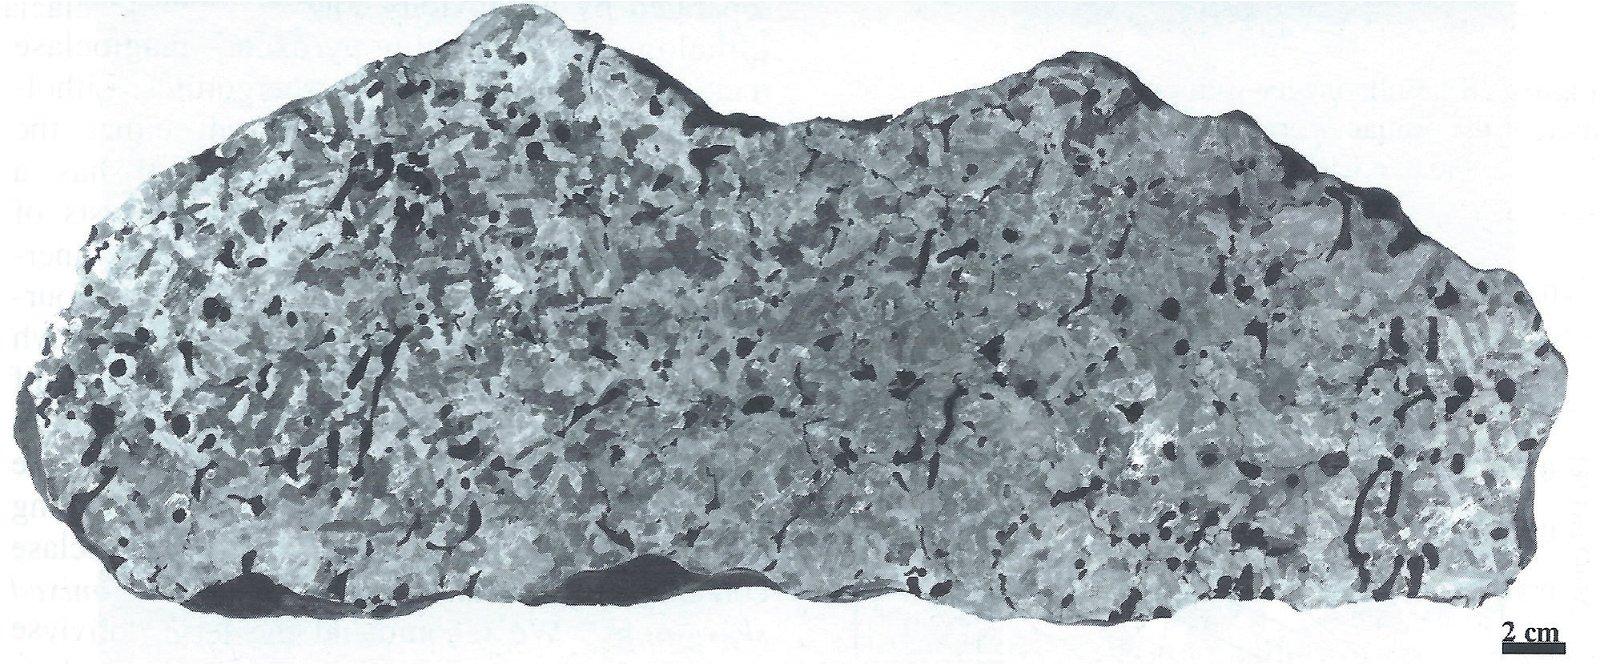 Dating meteorites